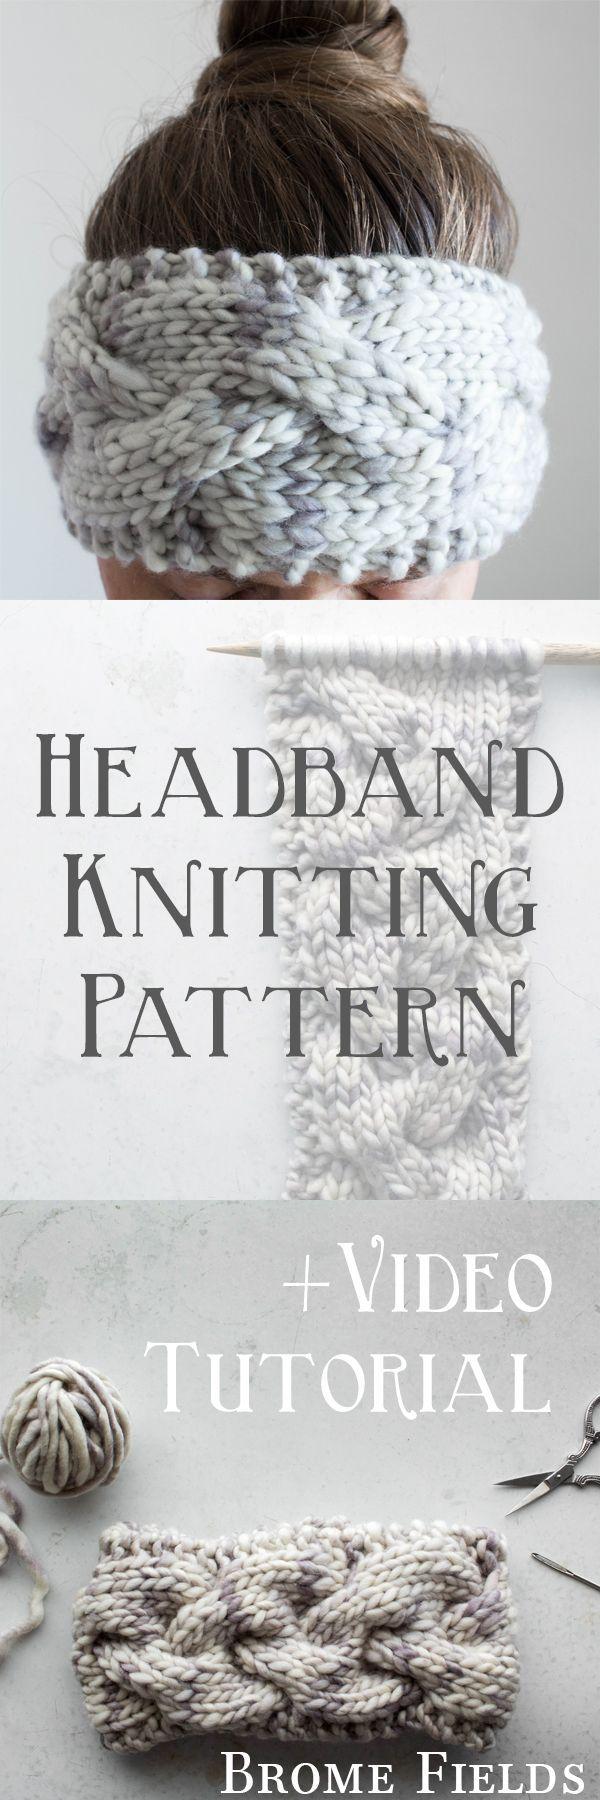 Headband Knitting Pattern : Braided Cable Knit Stitch : GOODNESS by ...